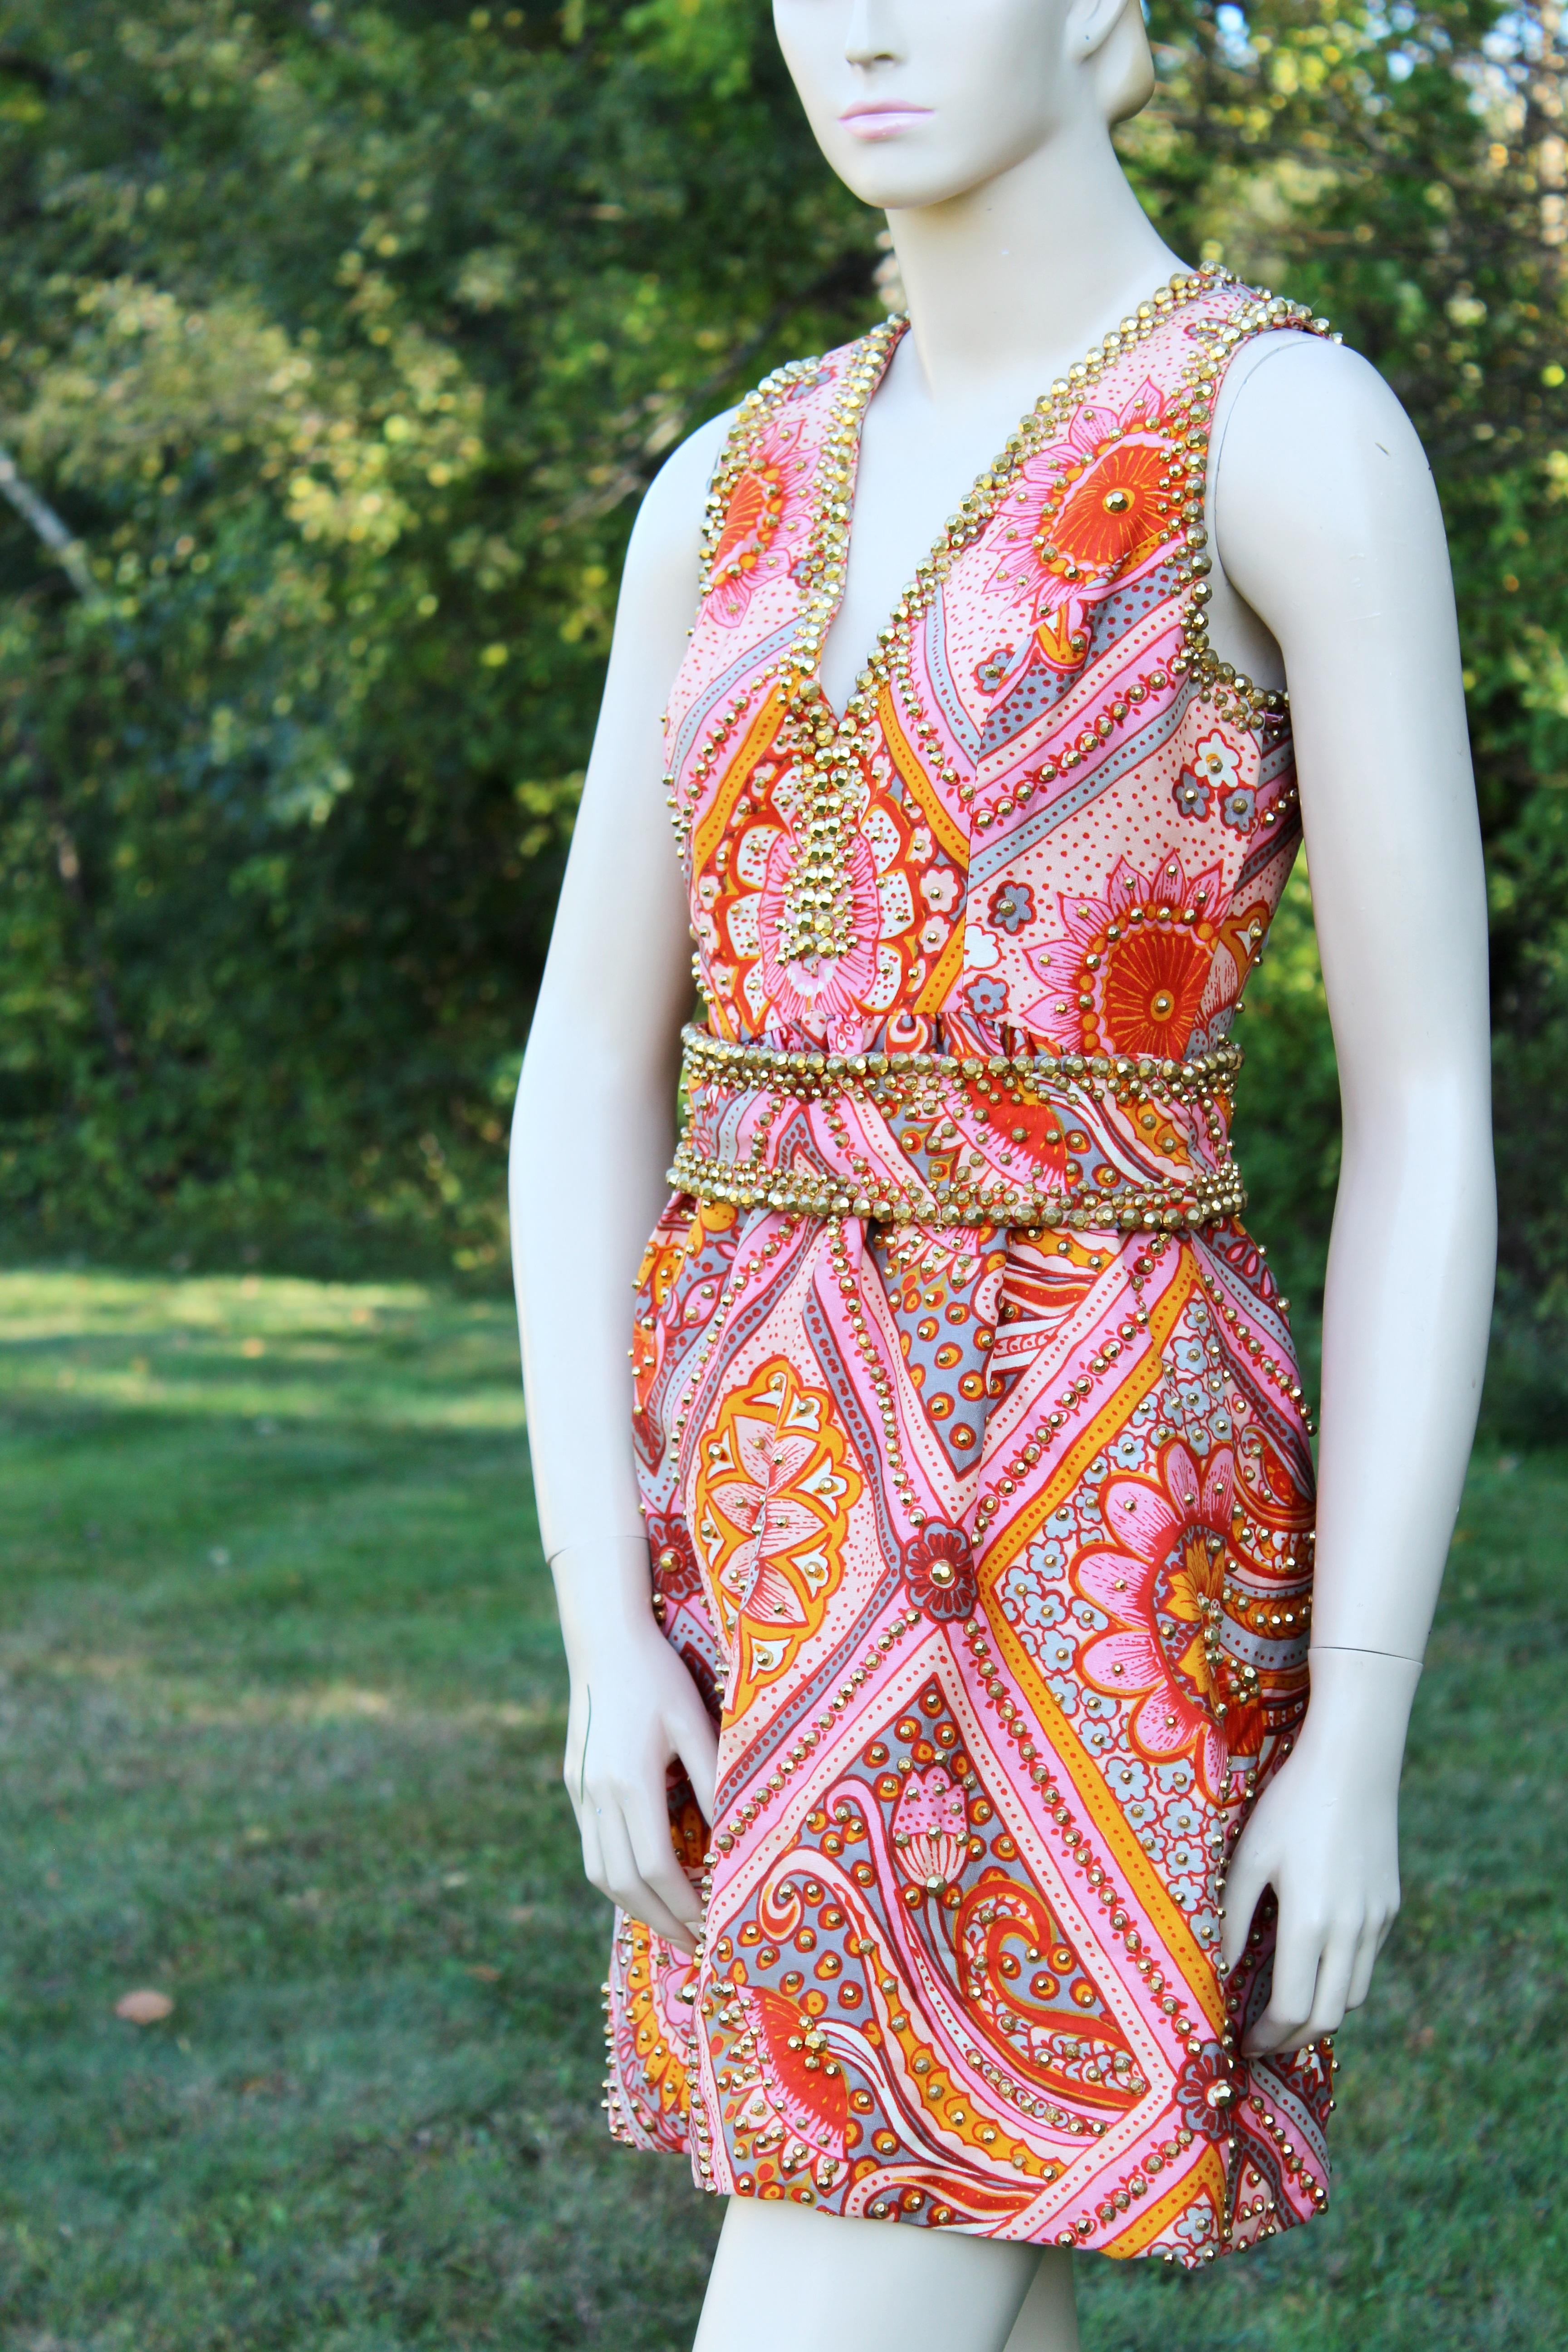 Oscar De La Renta Vintage Studded Dress